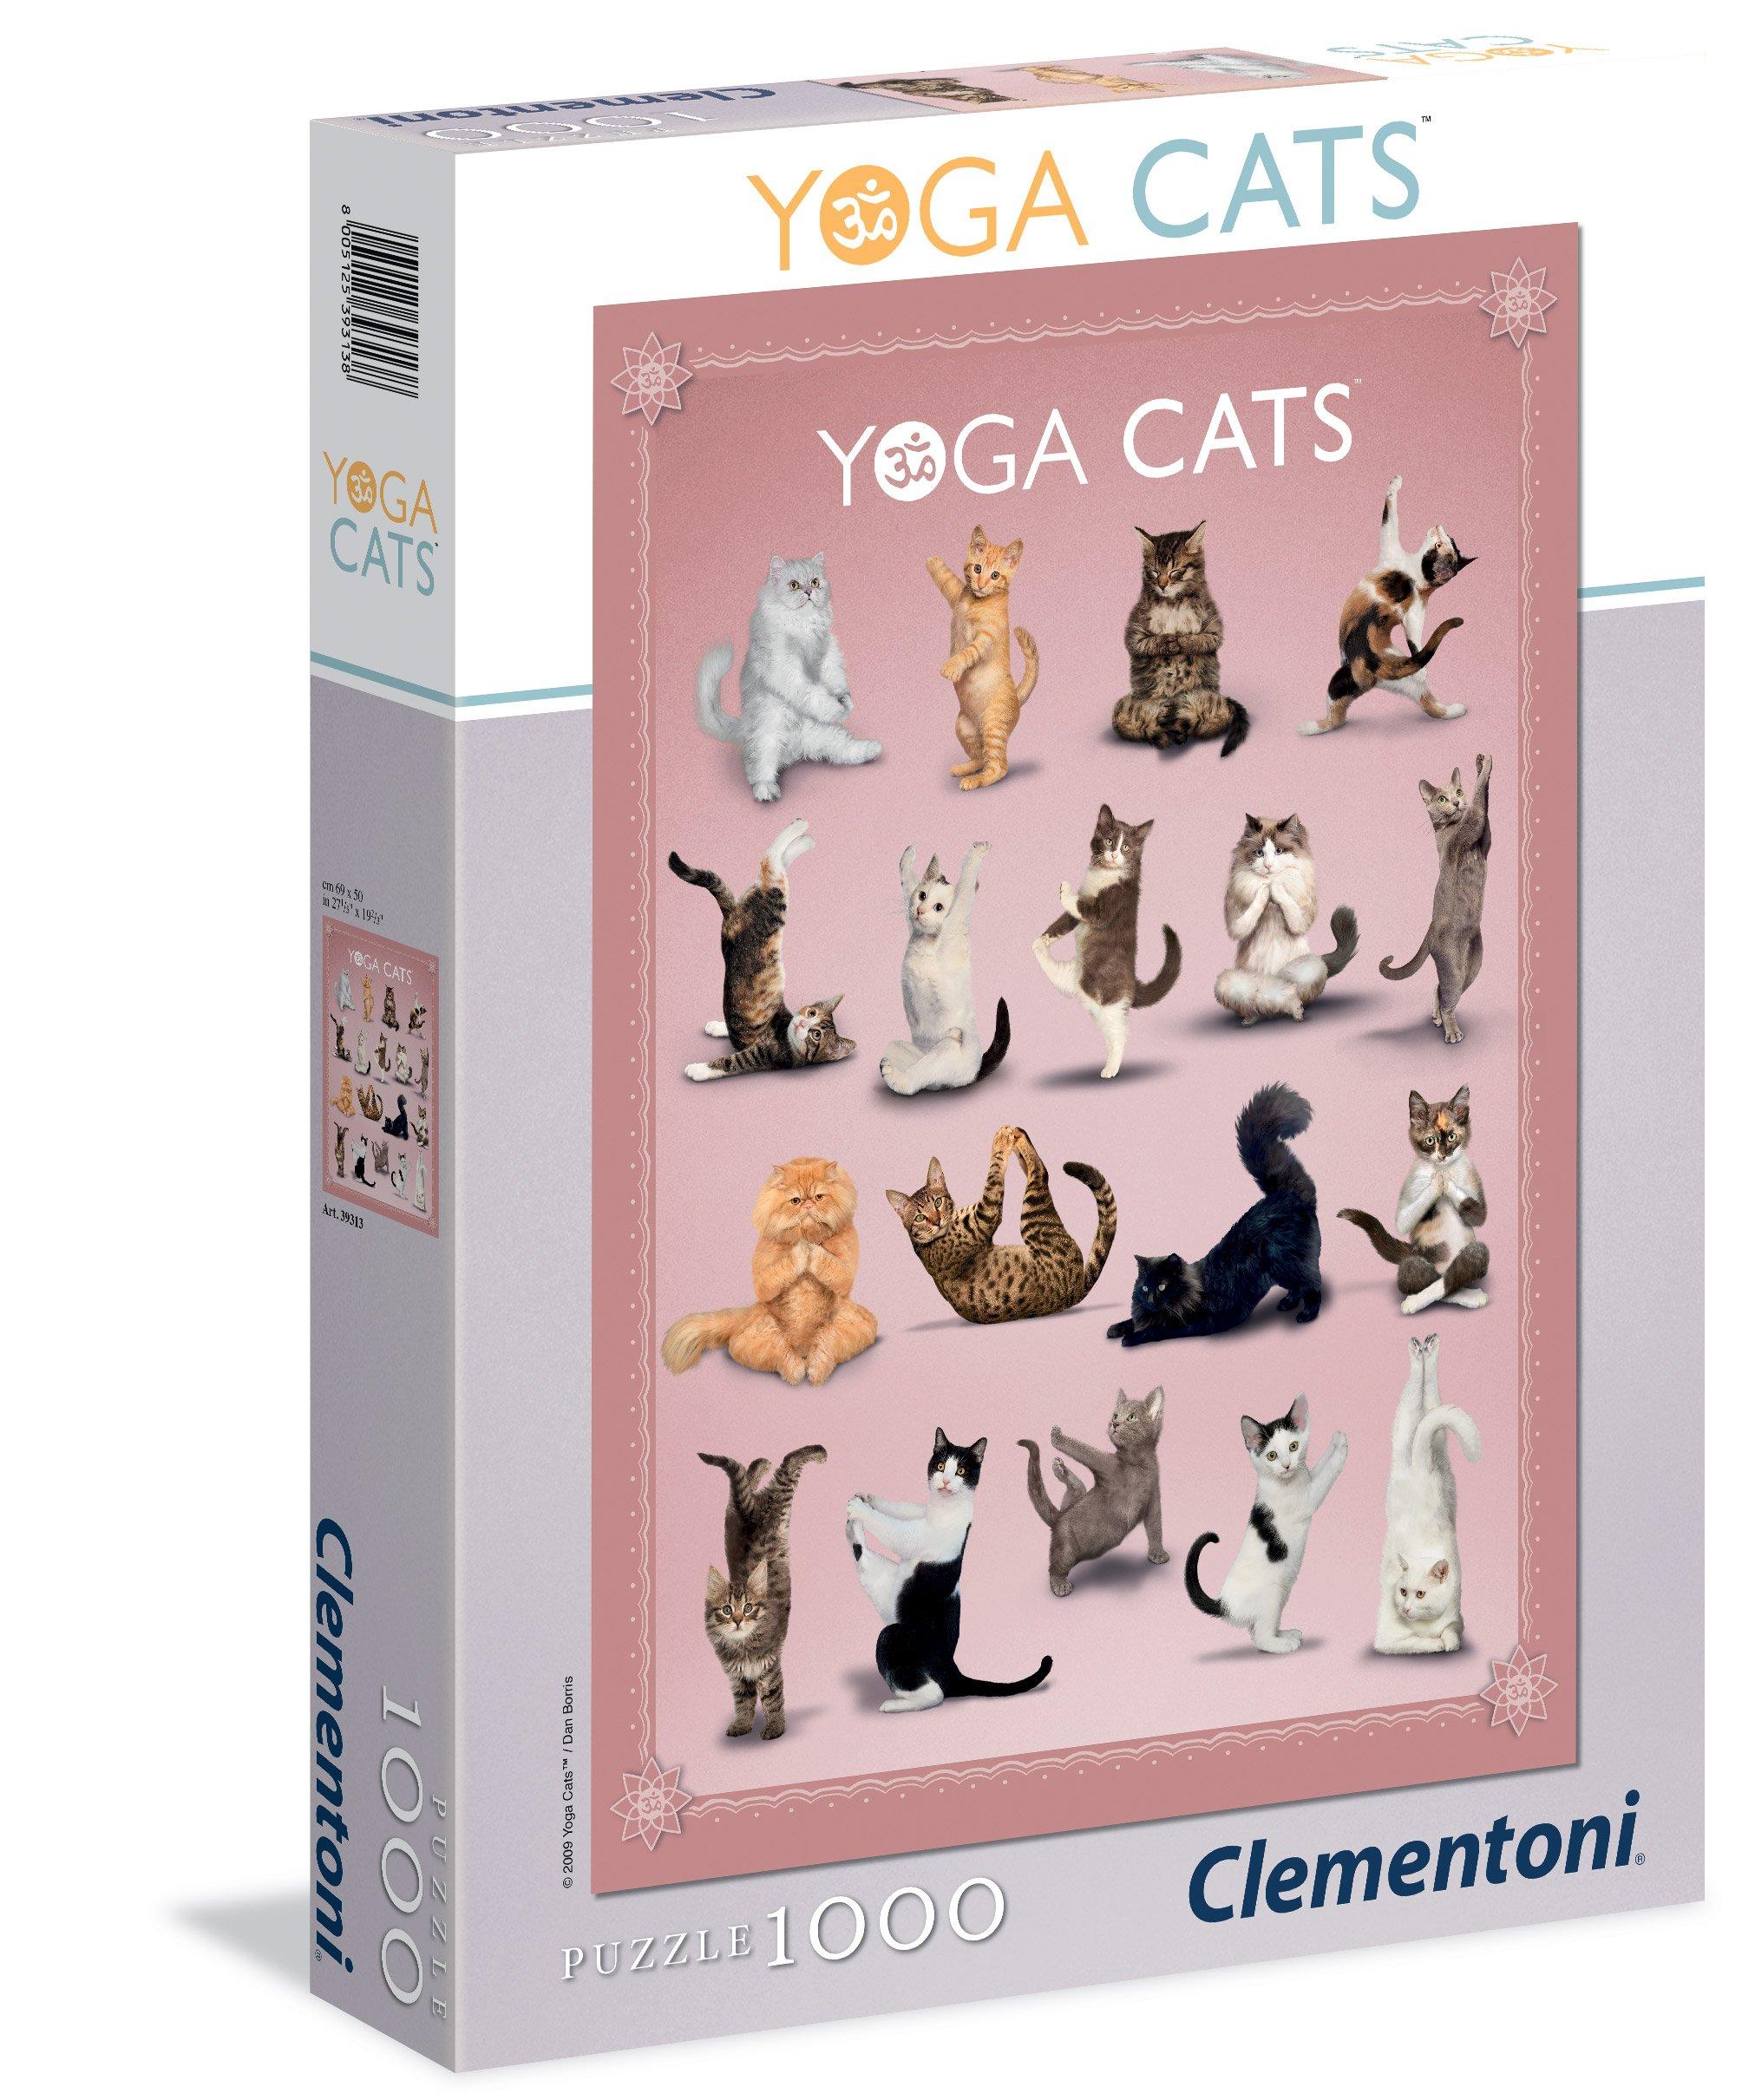 CLem.Пазл. 1000эл. Классика.39313.Дэн Боррис YOGA CATS yoga for cats